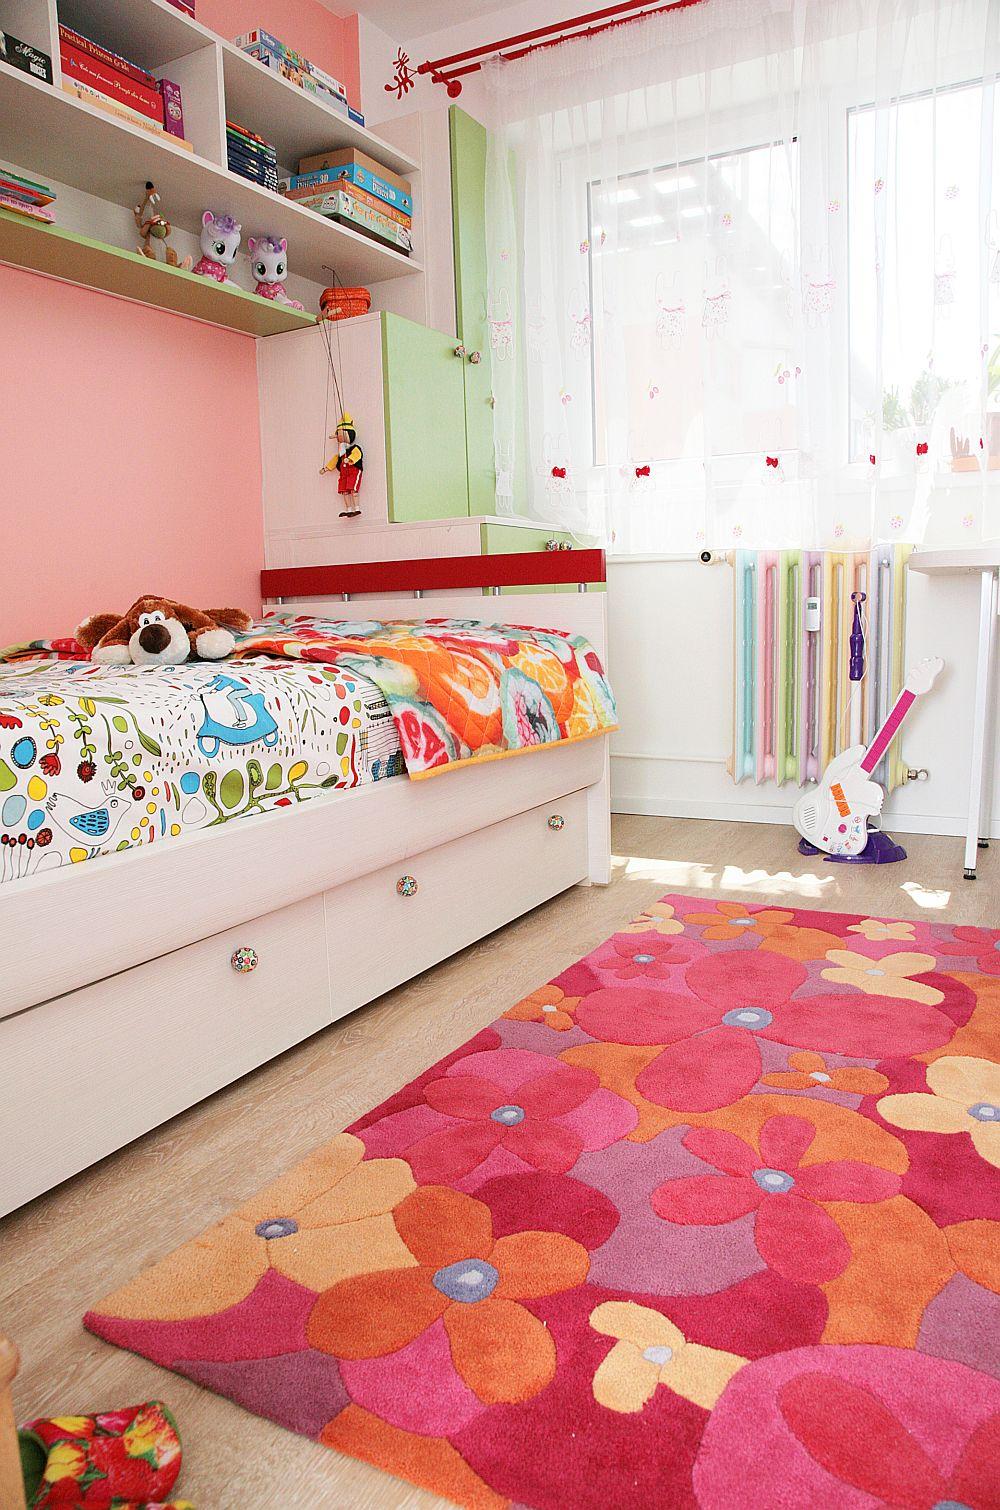 adelaparvu.com despre amenajare apartament Bucuresti, design interior Alia Bakutayan si Daniel Tufis - Valdecor (16)